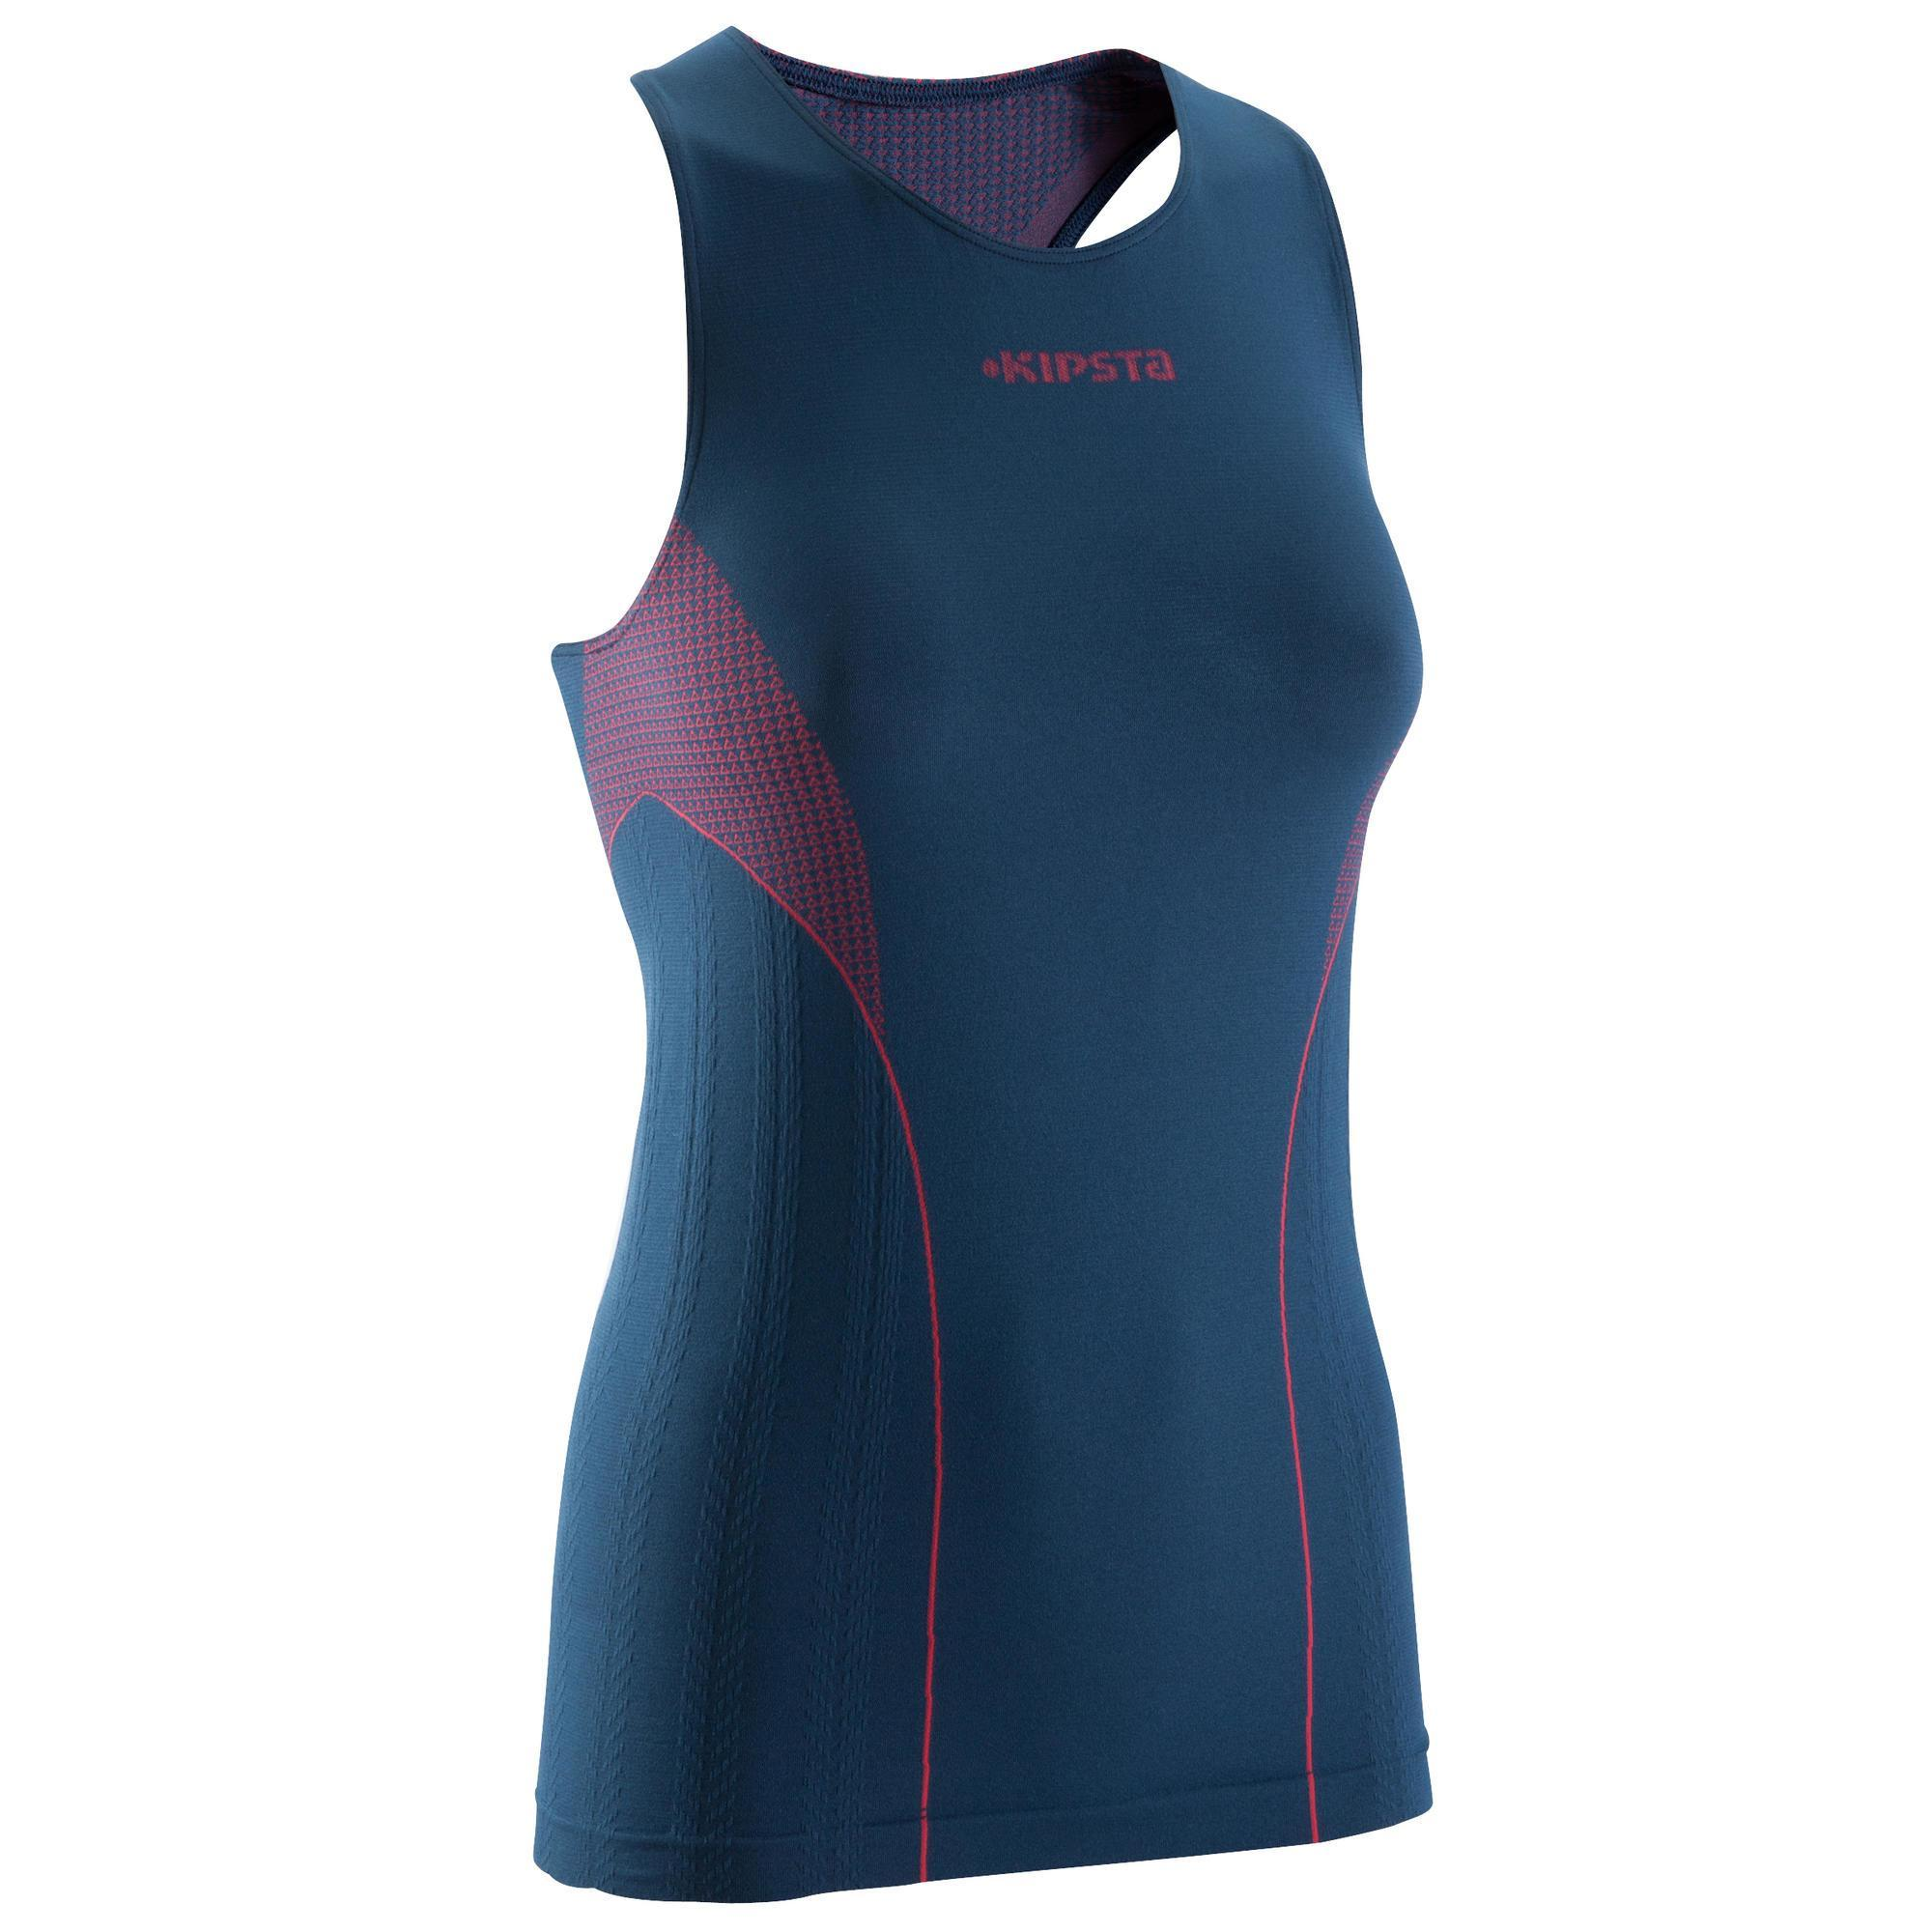 Damen Funktionsshirt Keepdry Damen blau rosa | 03583788317500